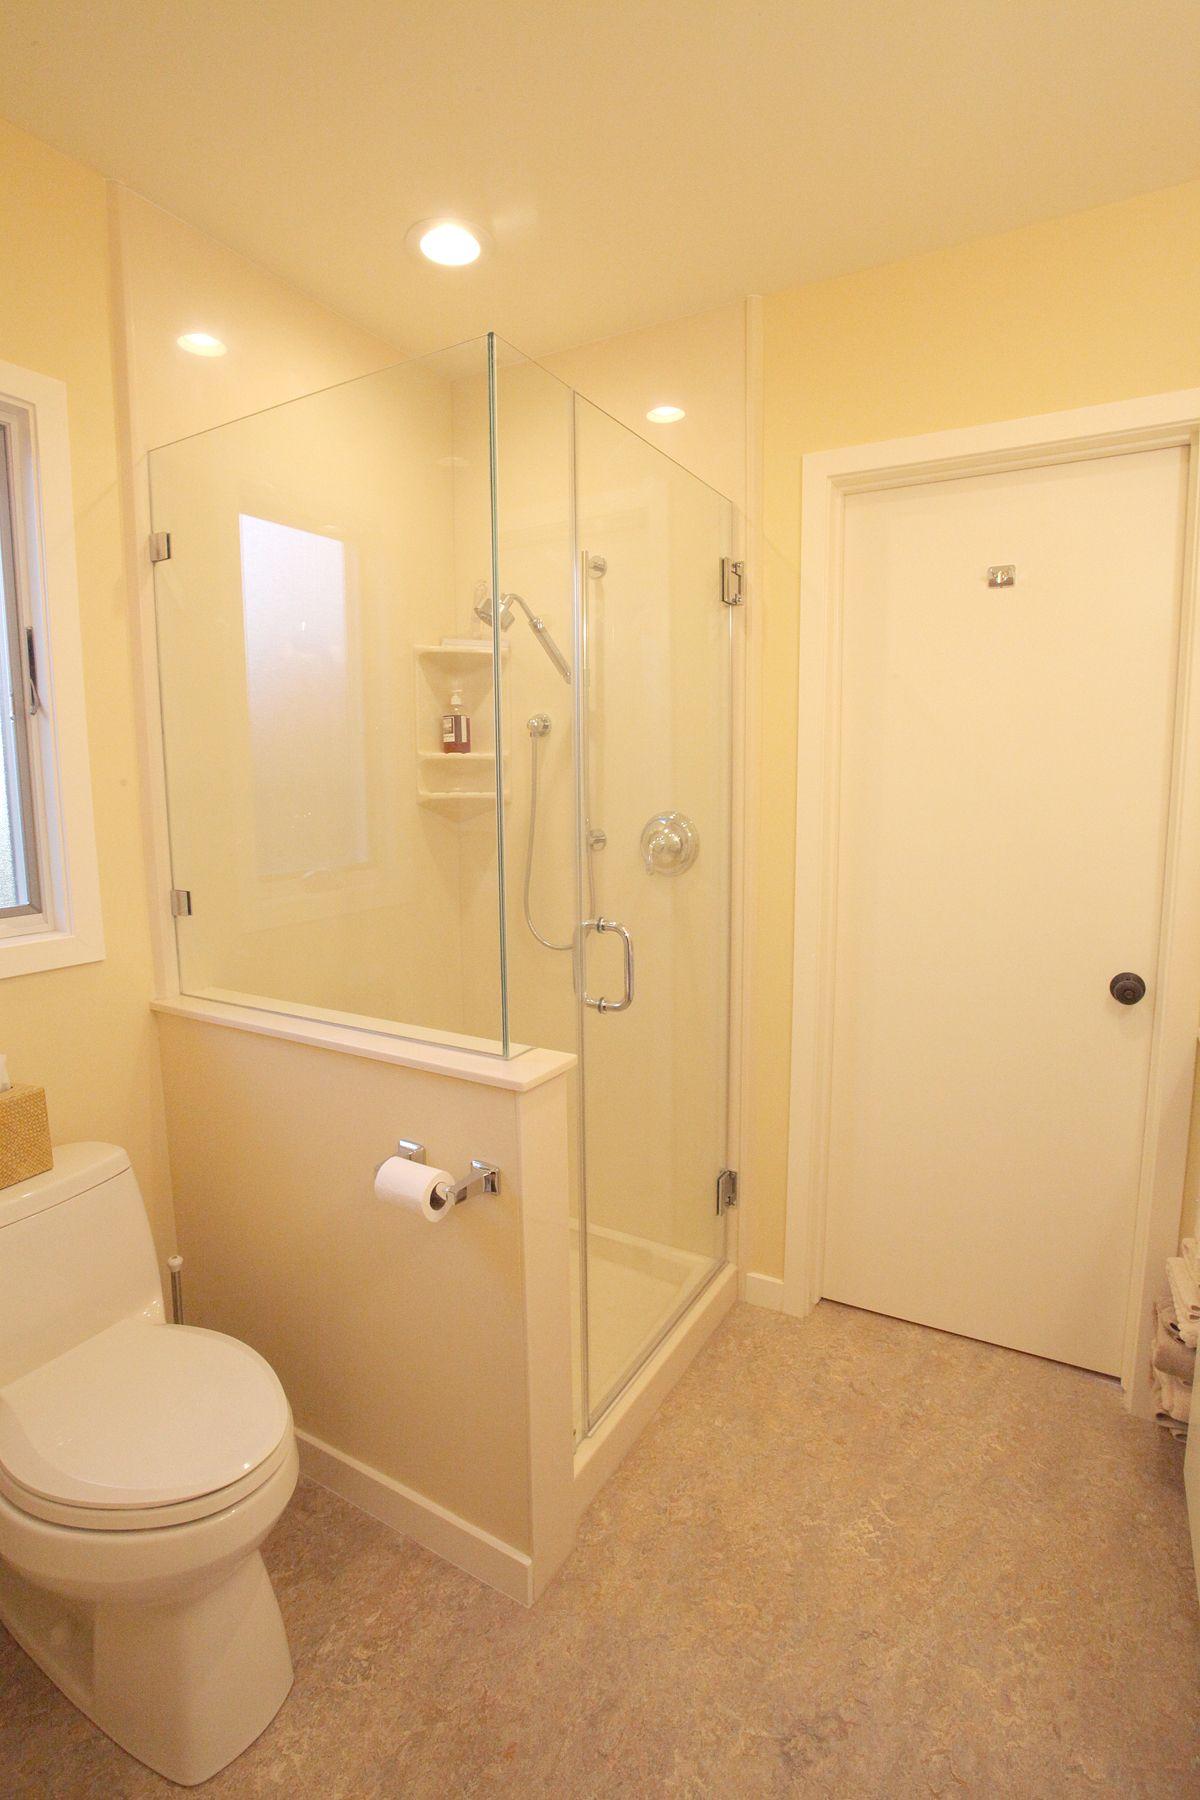 Marmoleum Flooring, Cultured Marble Shower Insert with Custom Fit ...